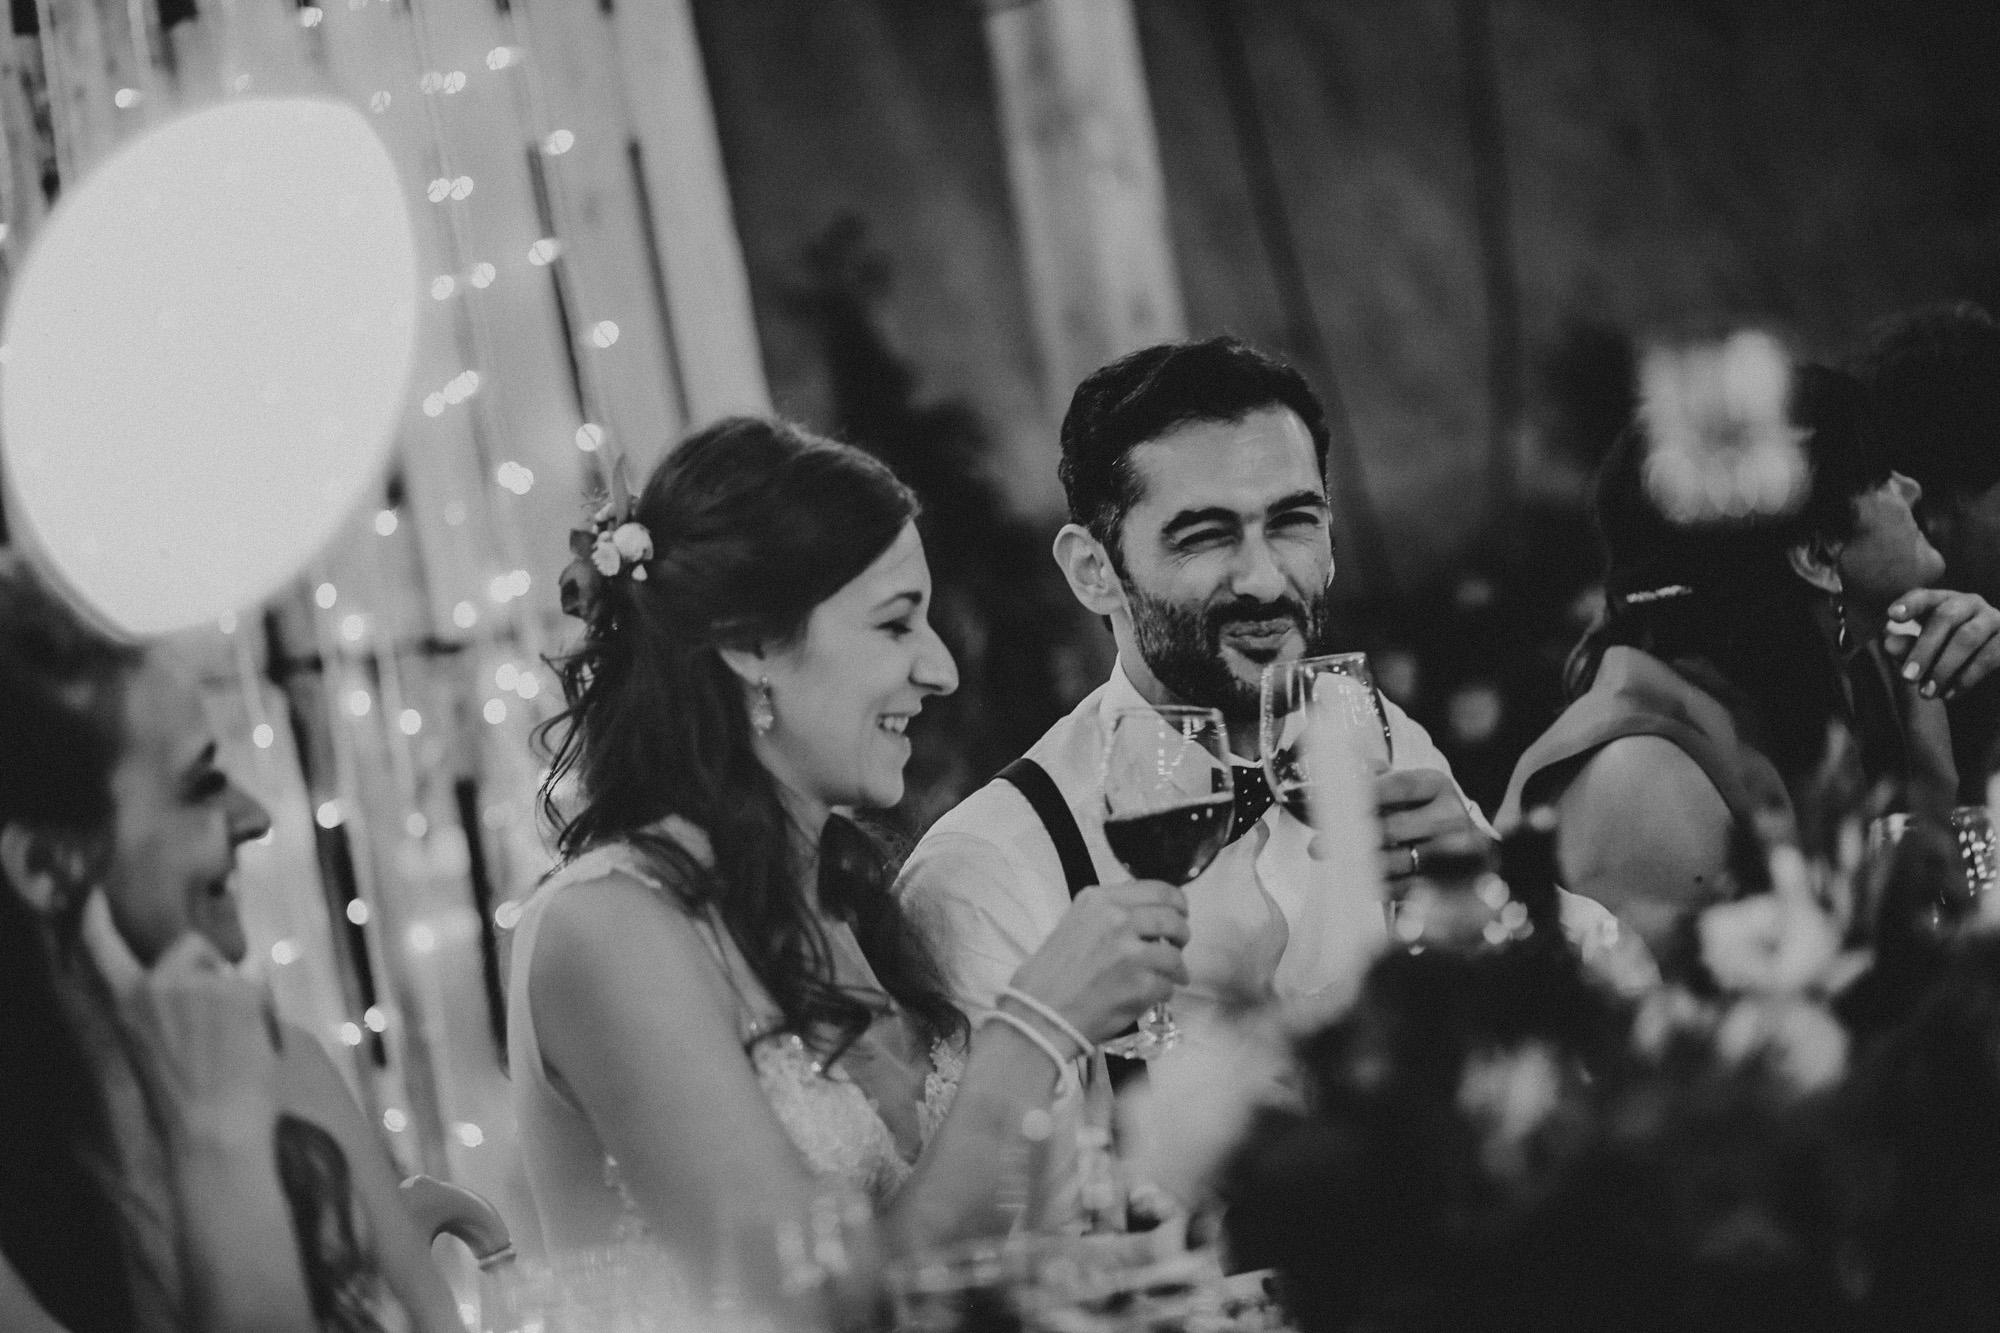 012-carina-e-samuel-wedding-casamento-quinta-dos-rouxinois-rustico-my-fancy-wedding-mafra-malveira-lisboa-sintra-cascais-filipe-santiago-fotografia-fotografo-lifestyle-destination-portugal